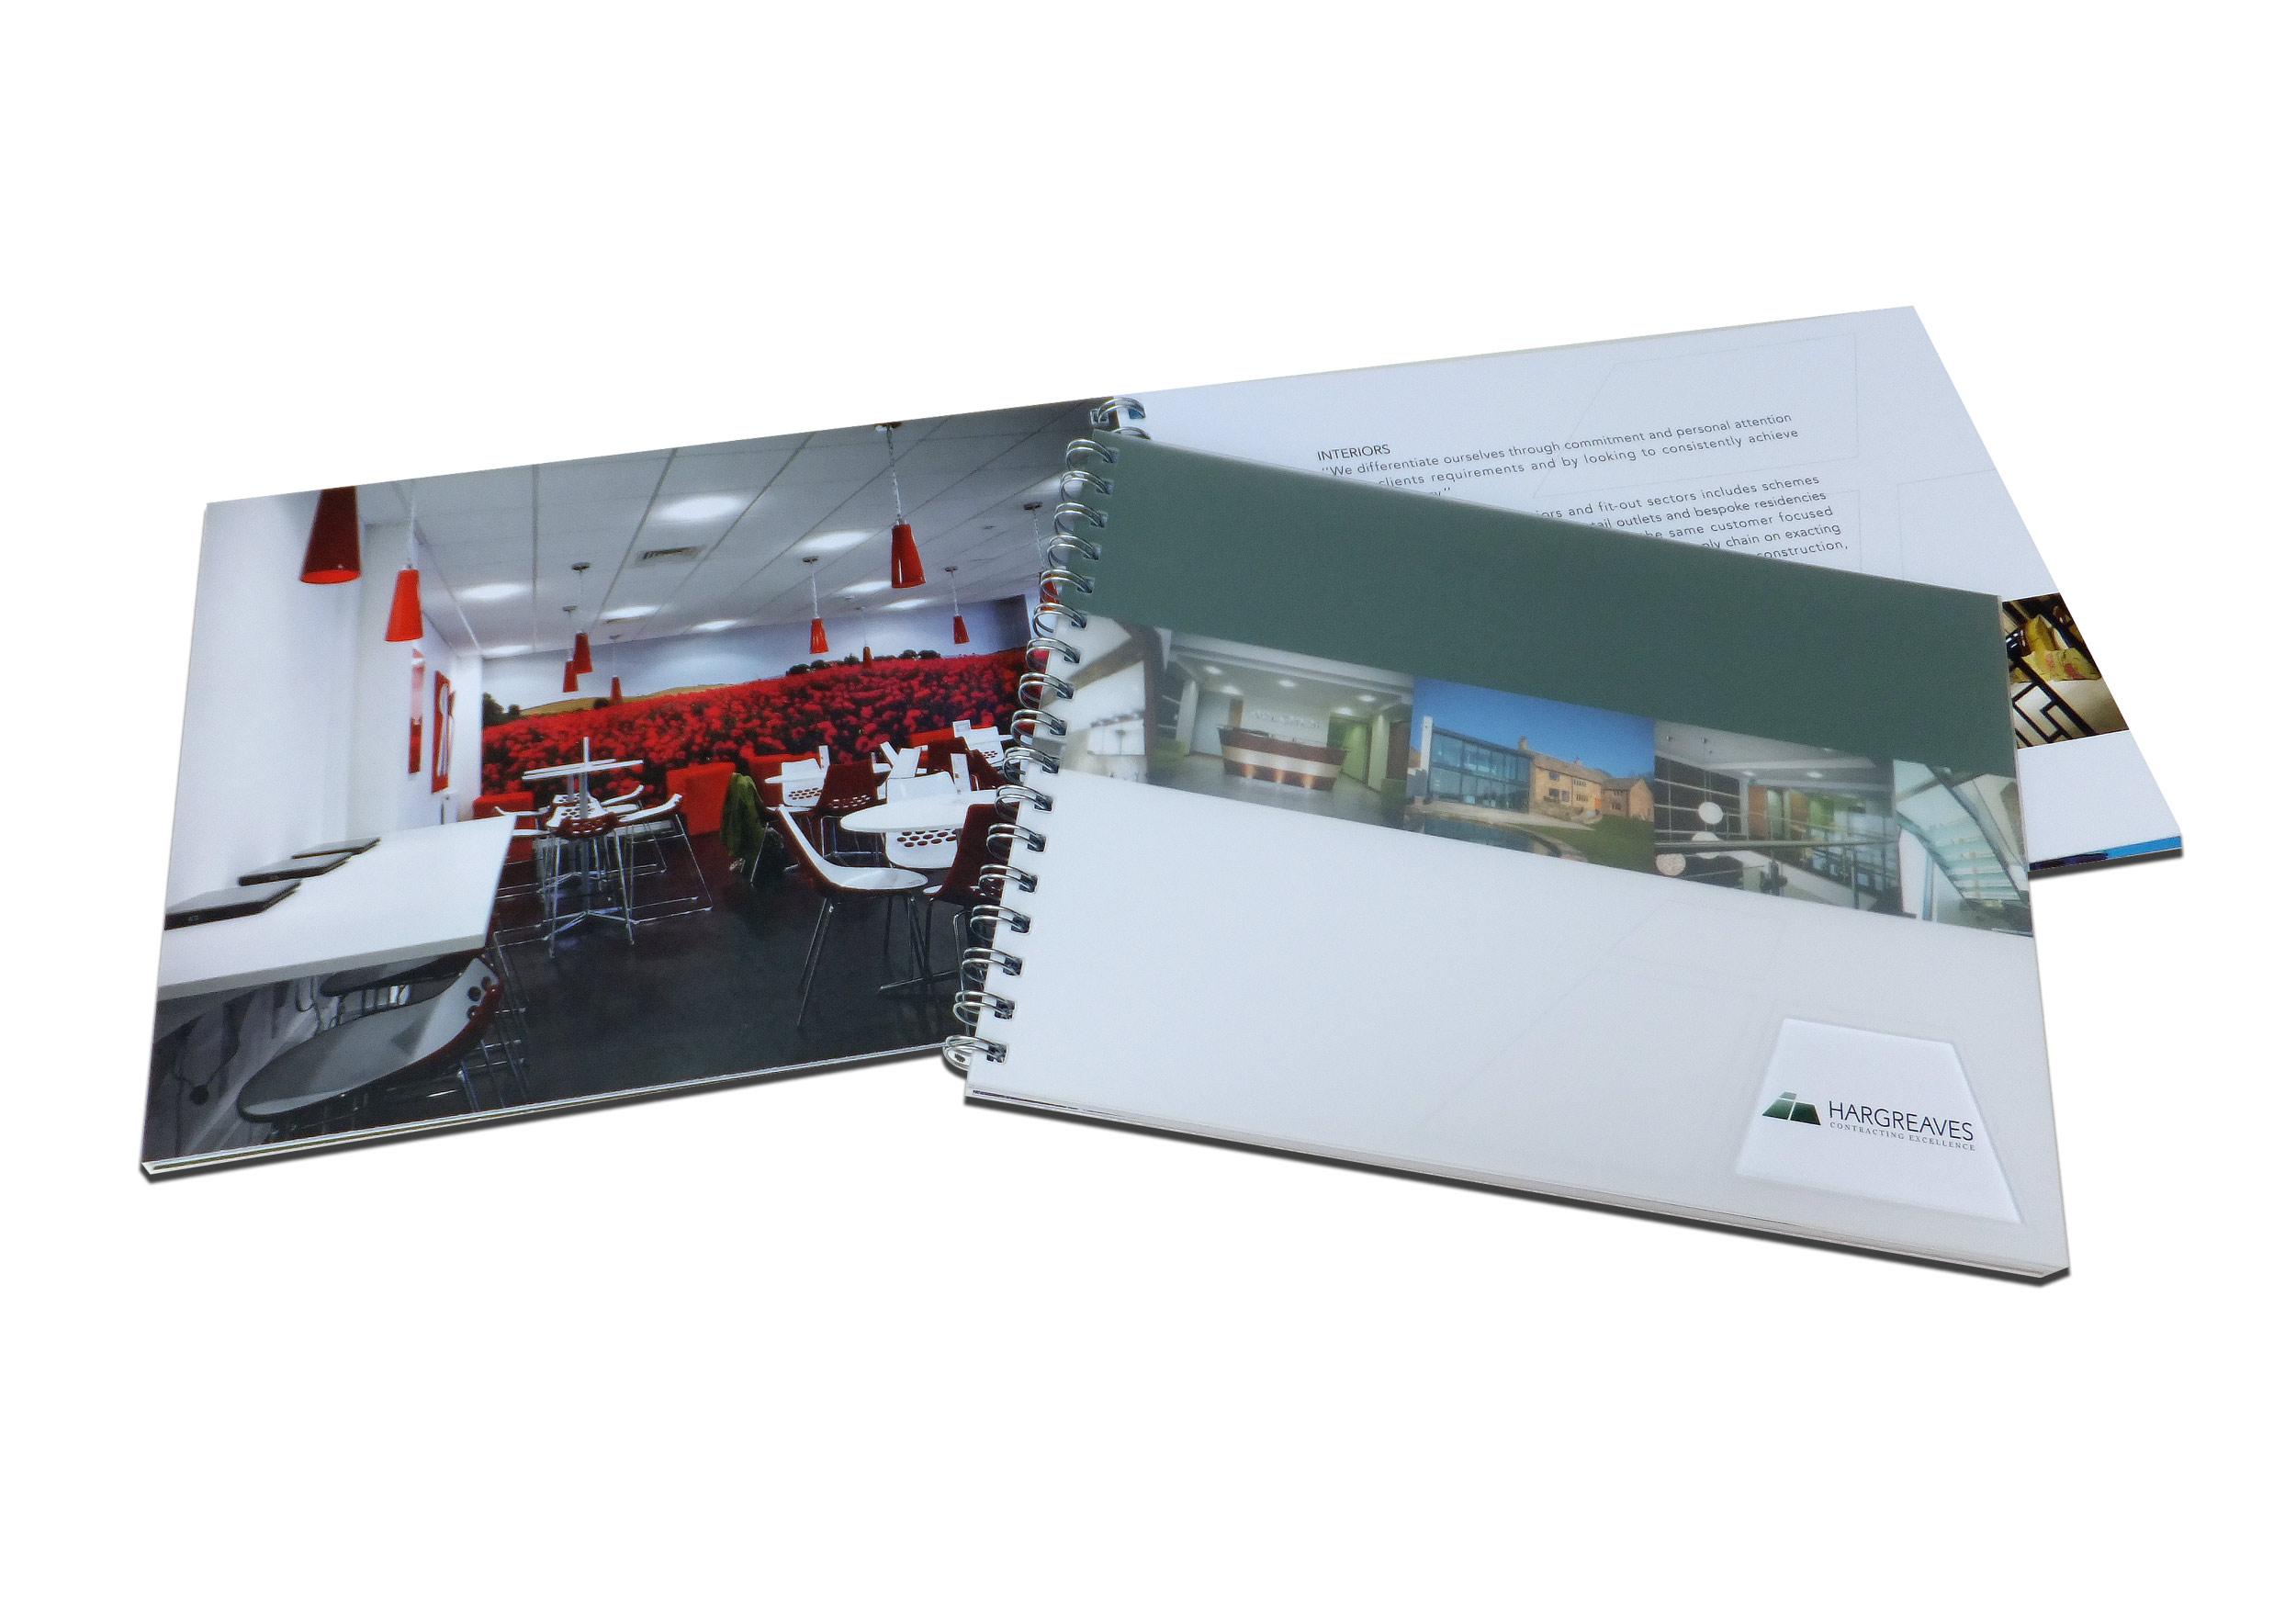 Hargreaves brochure